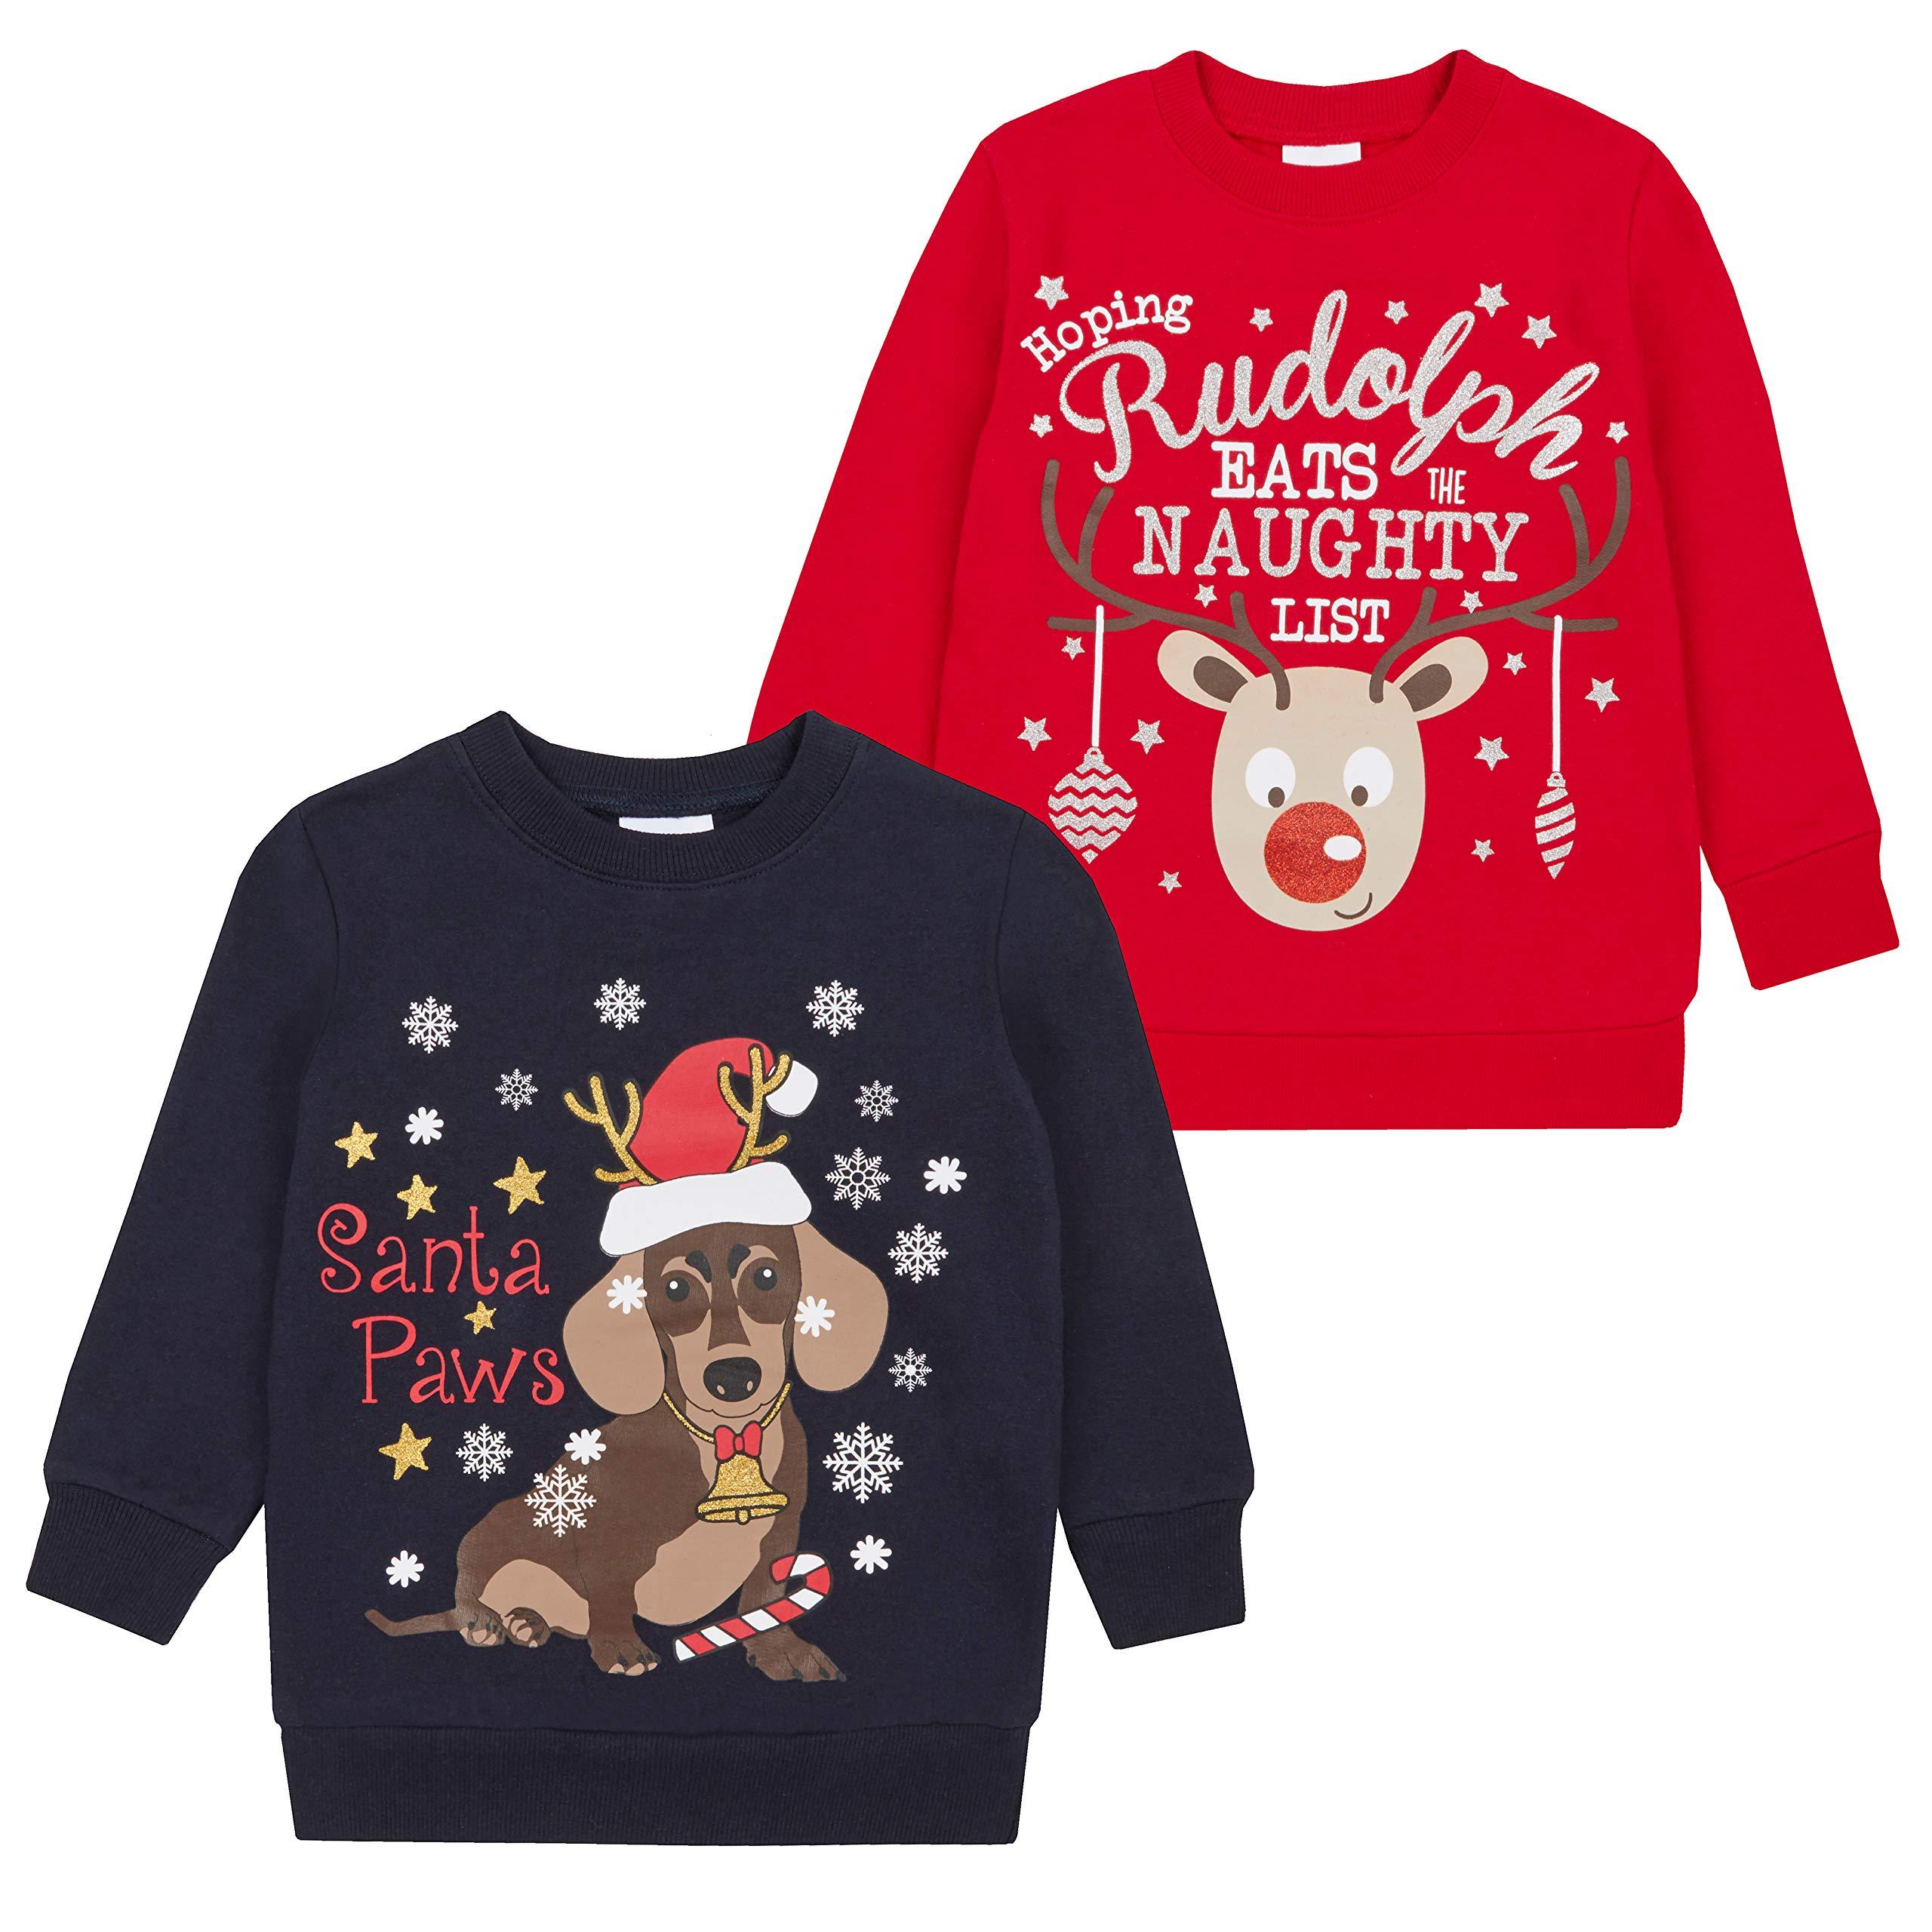 Metzuyan Children's Unisex Novelty Christmas Printed Sweater Santa Paws & Rudolph 4-5 Years